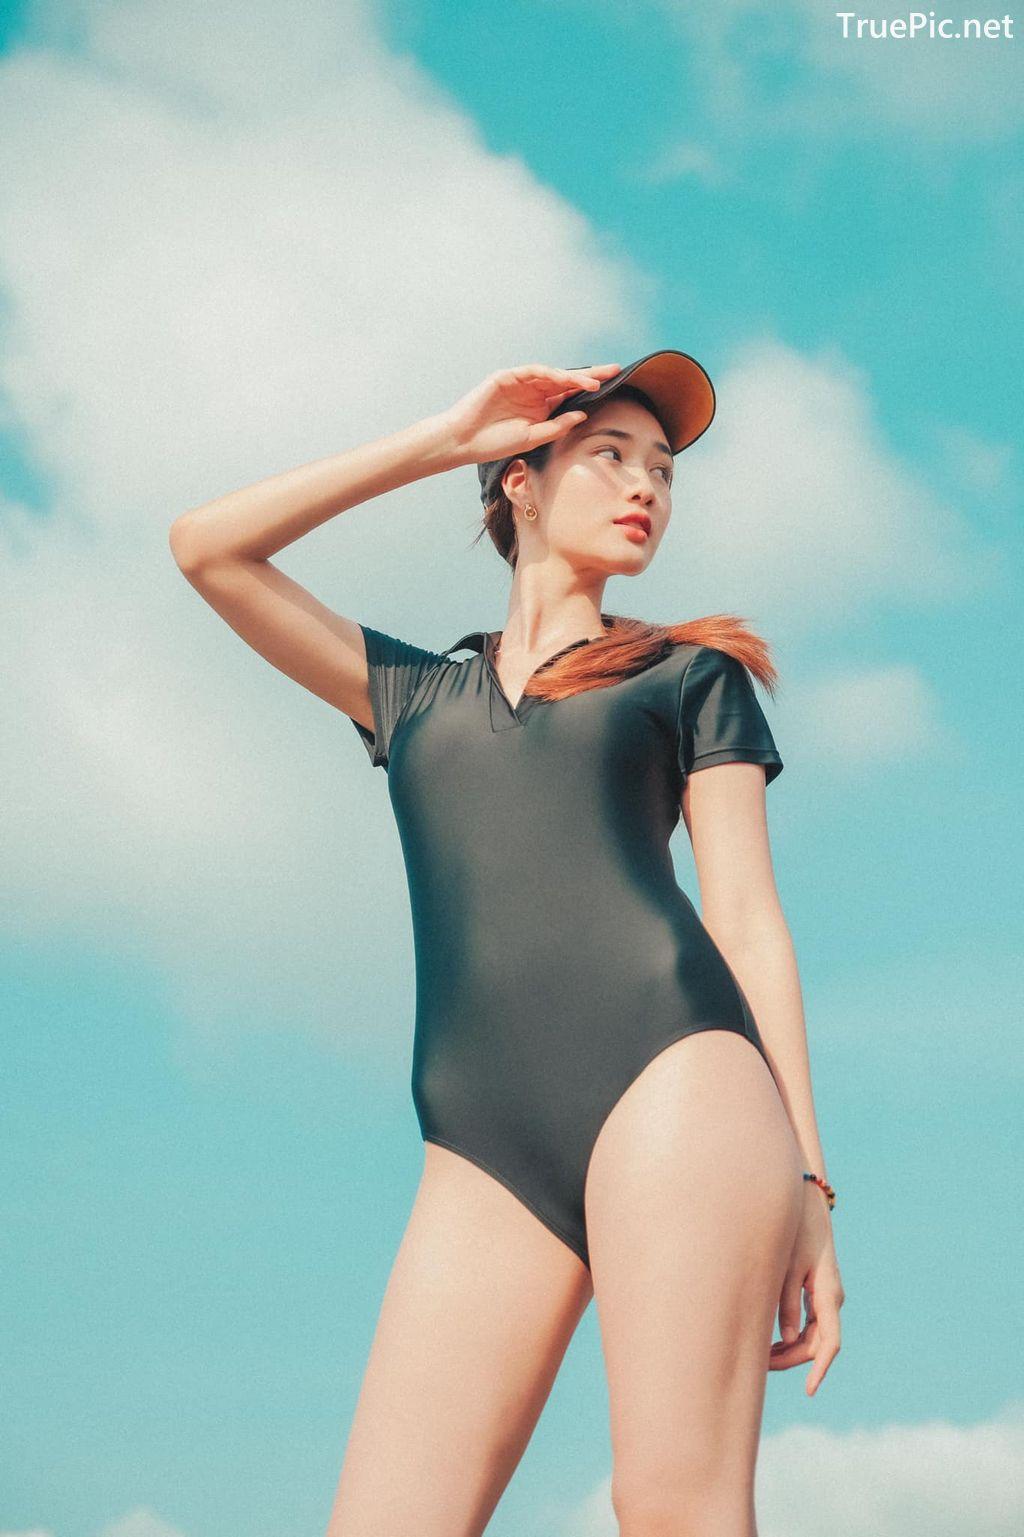 Image-Miss-Teen-Thailand-Kanyarat-Ruangrung-Black-Swimsuit-TruePic.net- Picture-2